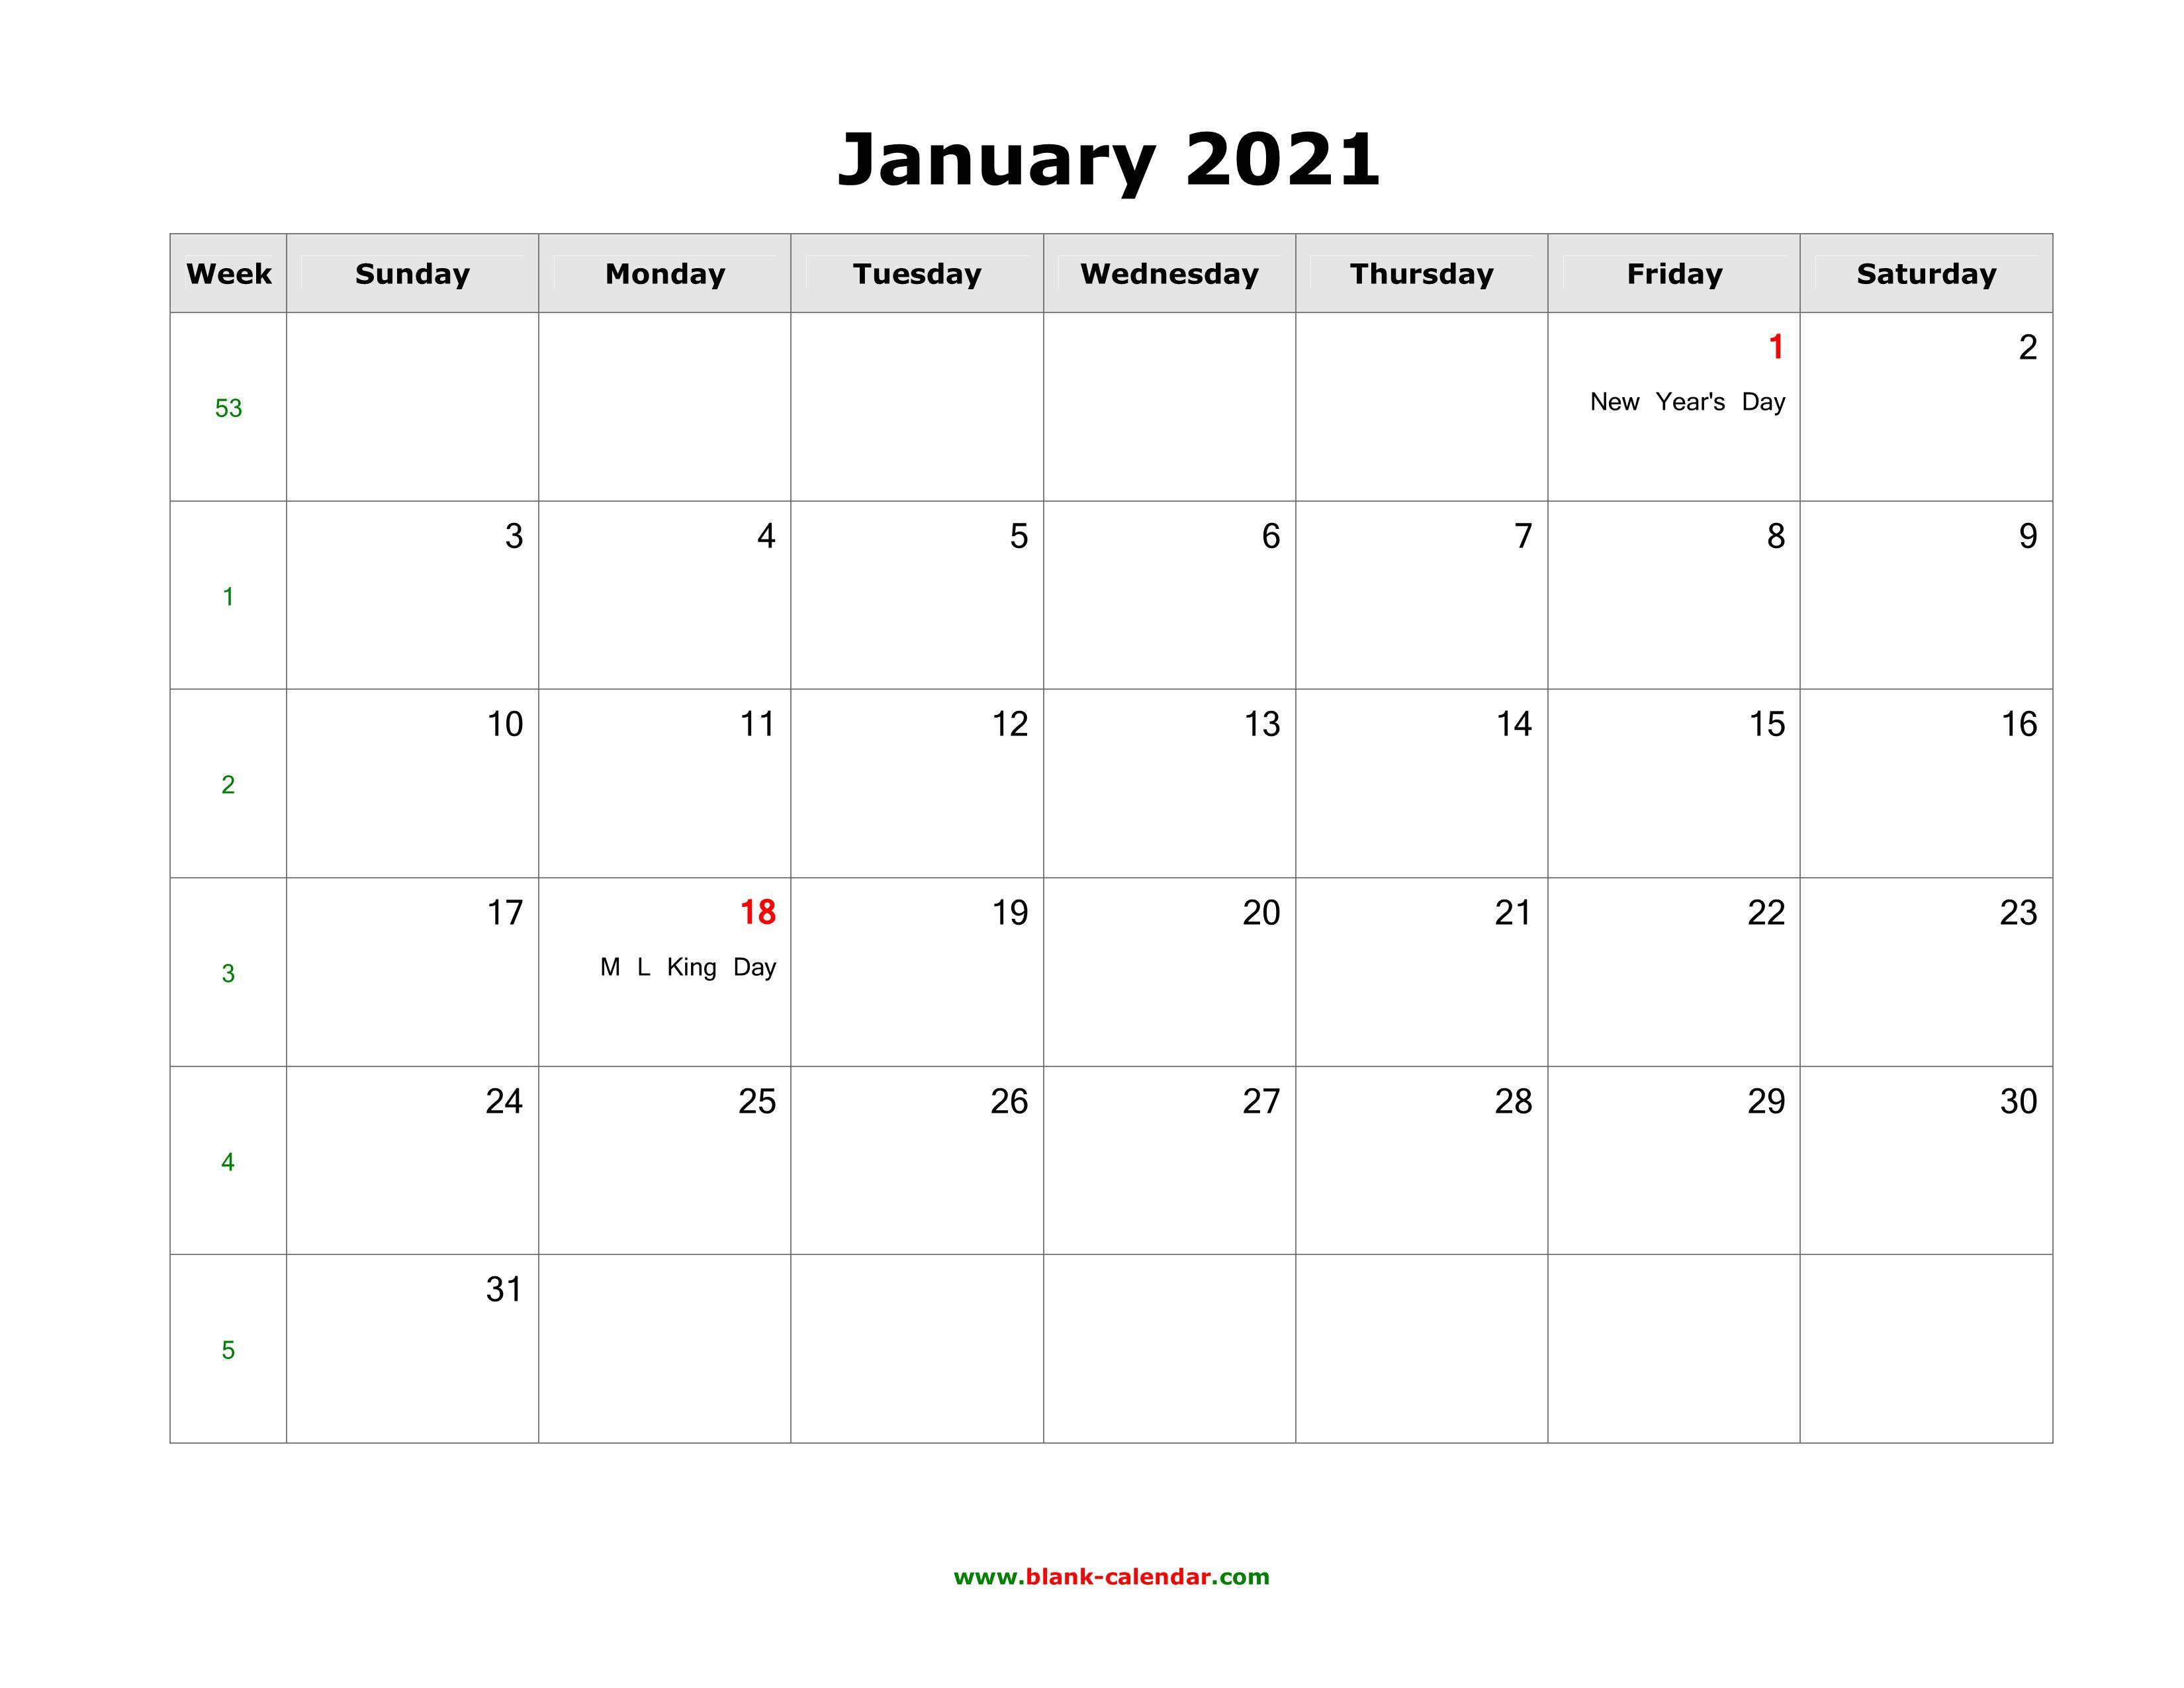 002 Best Google Doc Weekly Calendar Template 2021 High Resolution  FreeFull